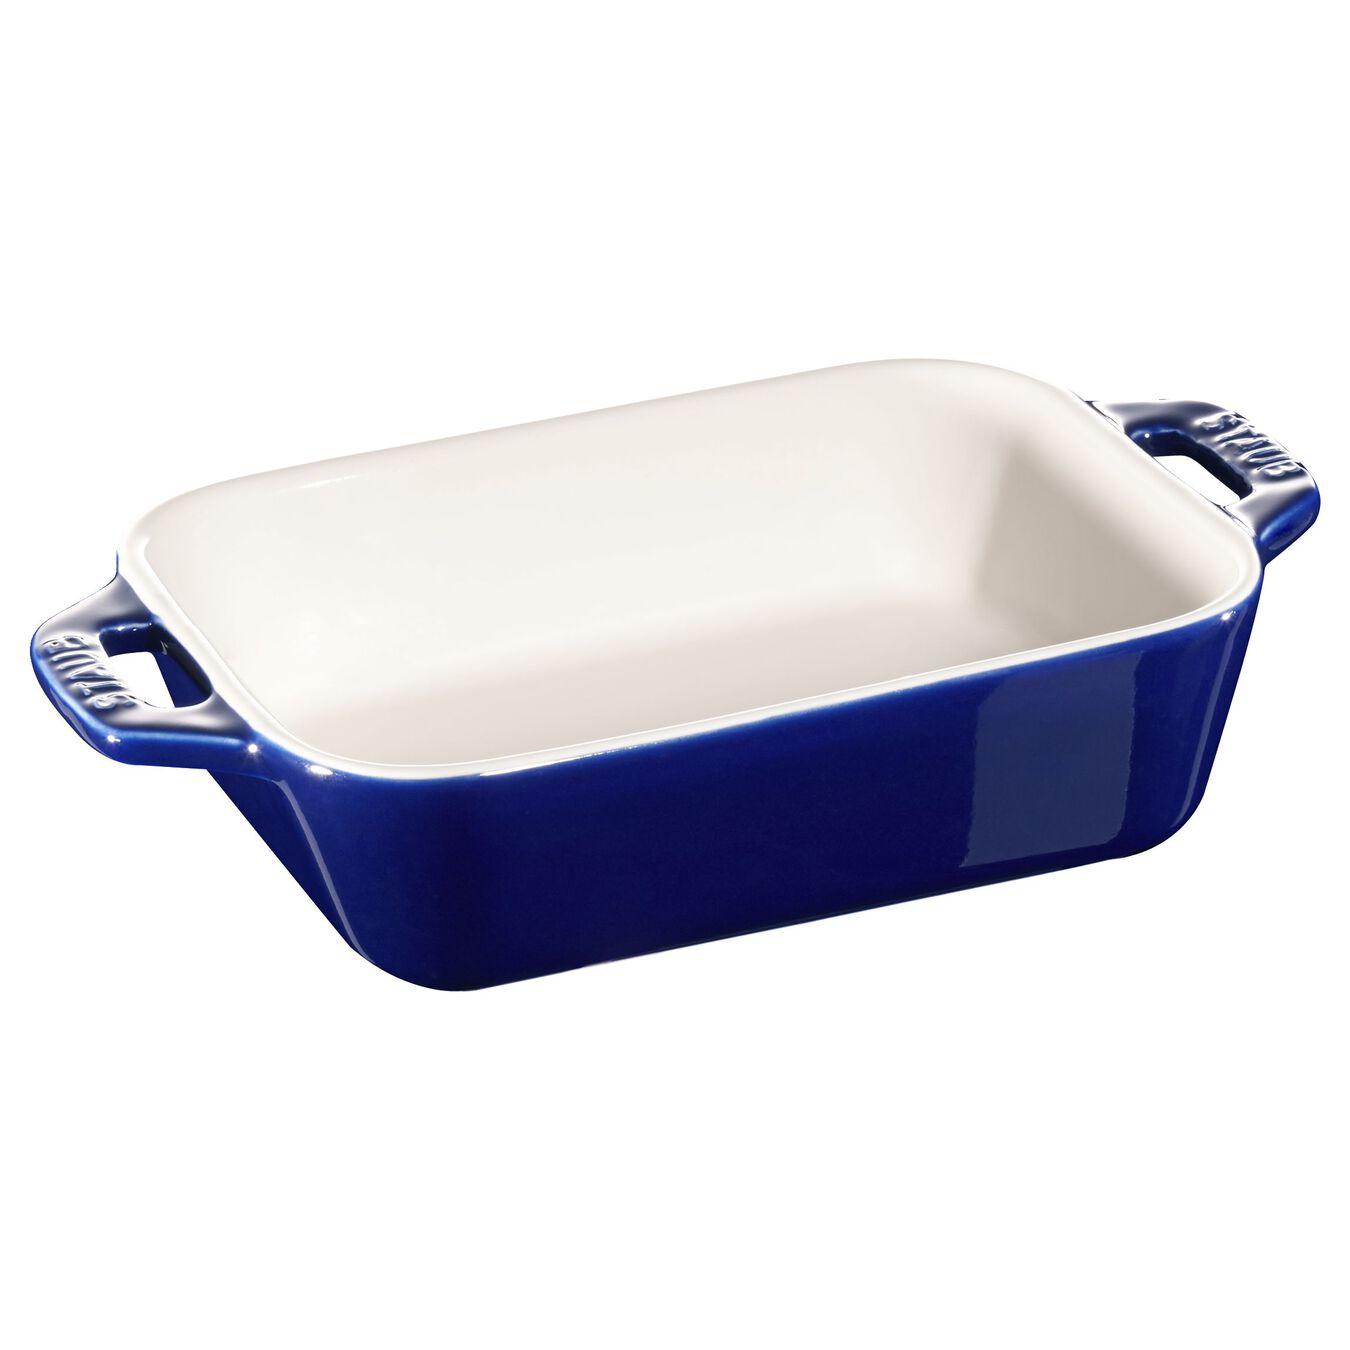 Ceramic rectangular Plat empilable, Dark-Blue,,large 1